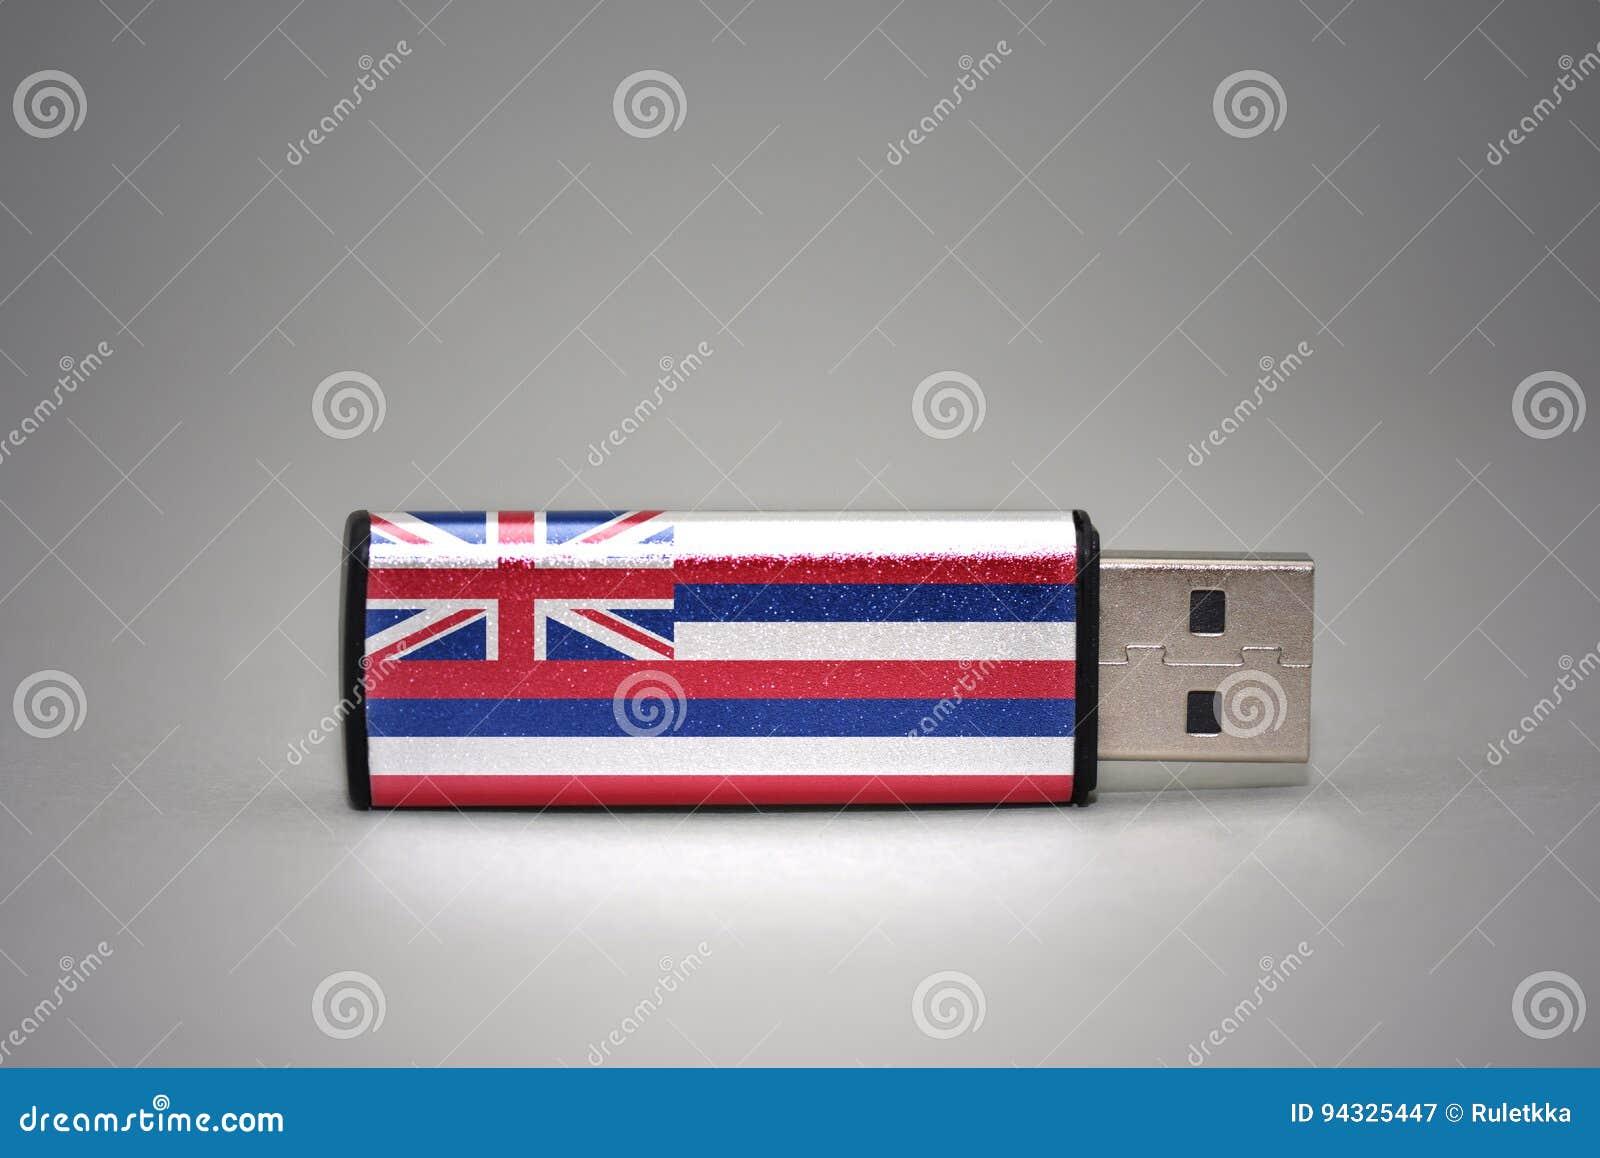 Usb与夏威夷状态旗子的闪光驱动在灰色背景